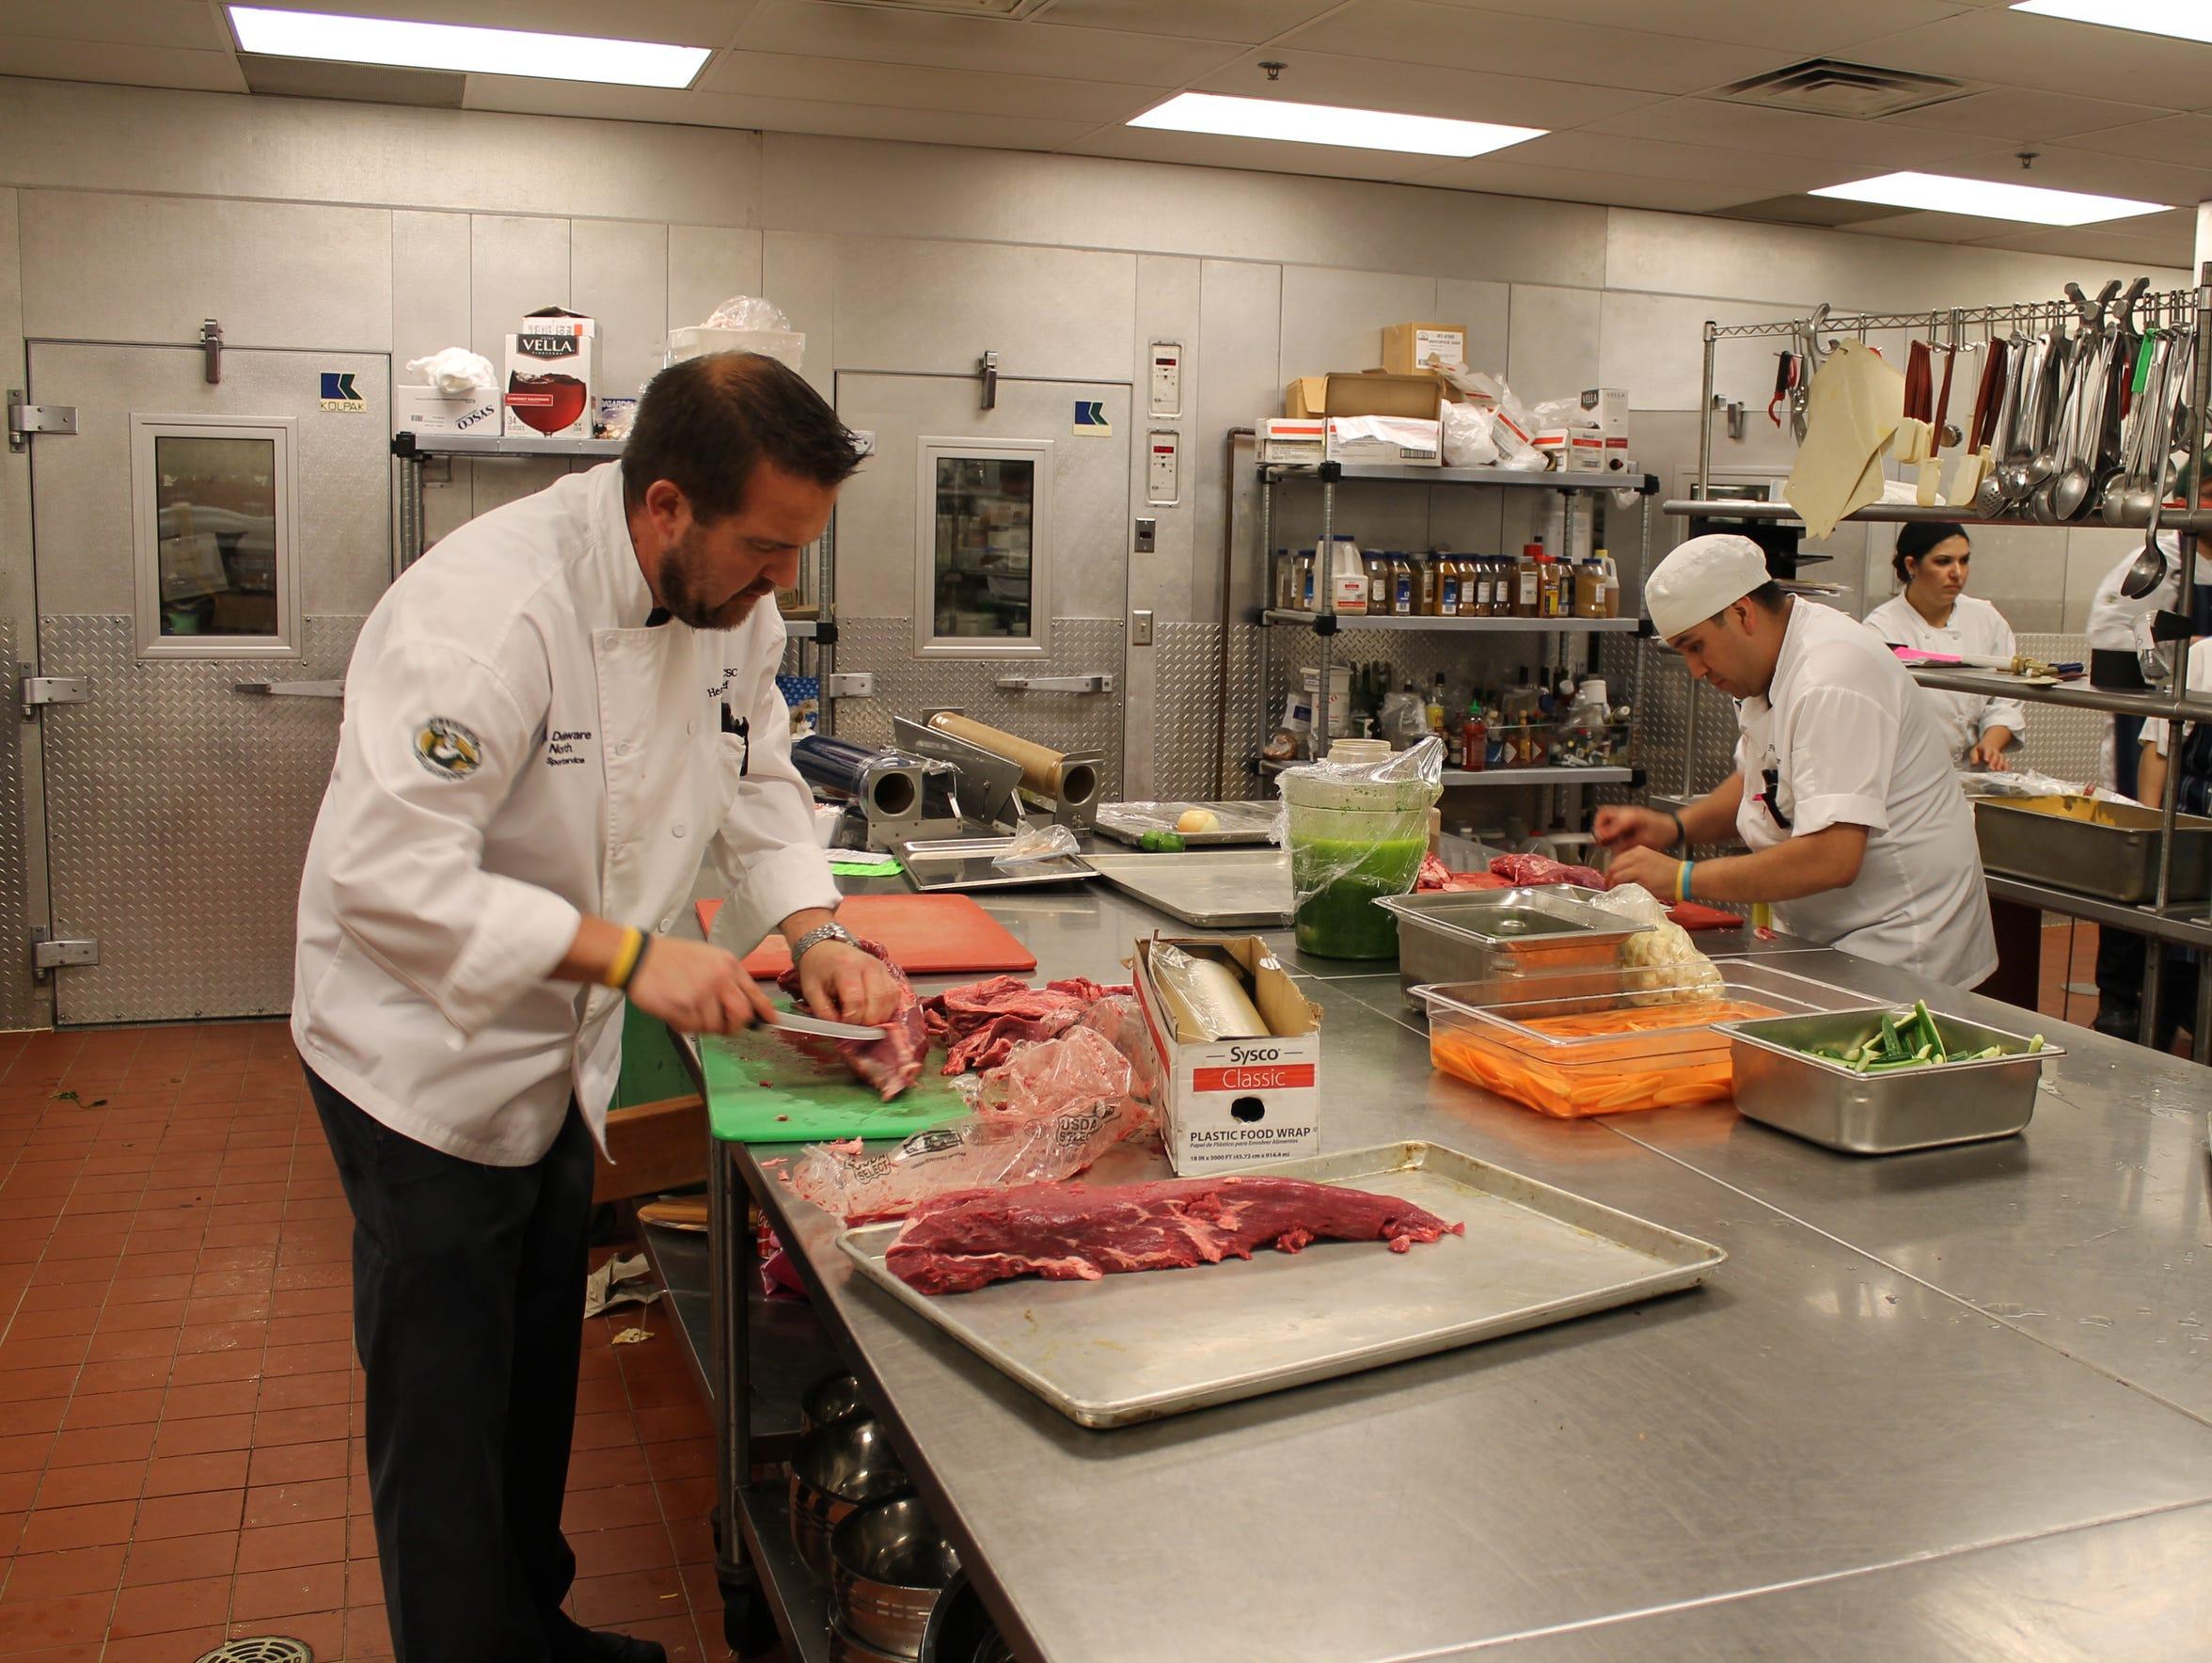 Heath Barbato, Lambeau Field executive chef, is usually